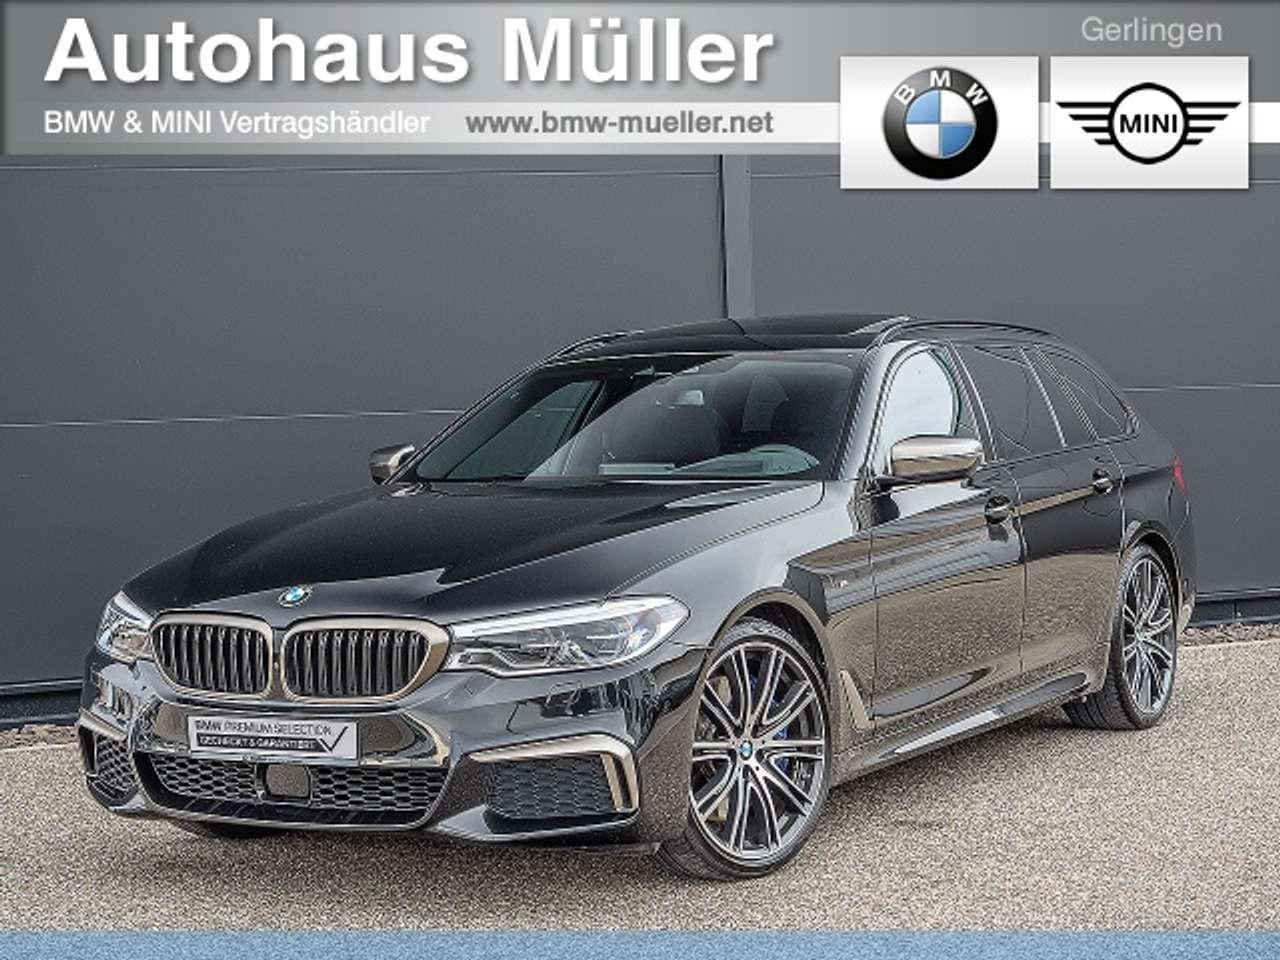 Autos nach BMW 5-Series M550d Touring xDrive